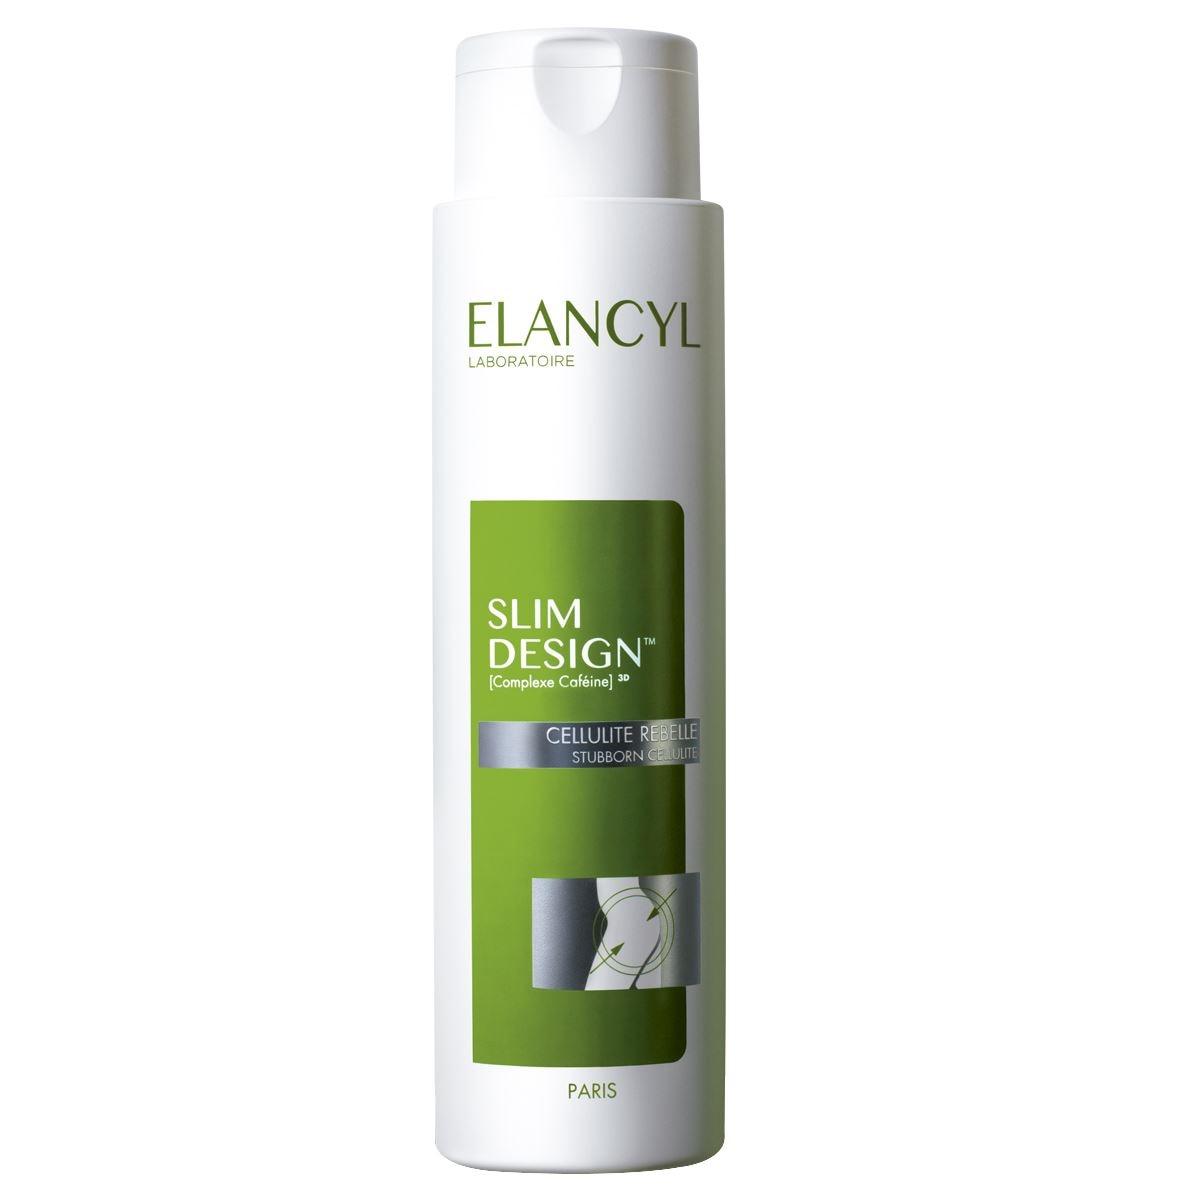 Crema para Celulítis Elancyl Slim Design